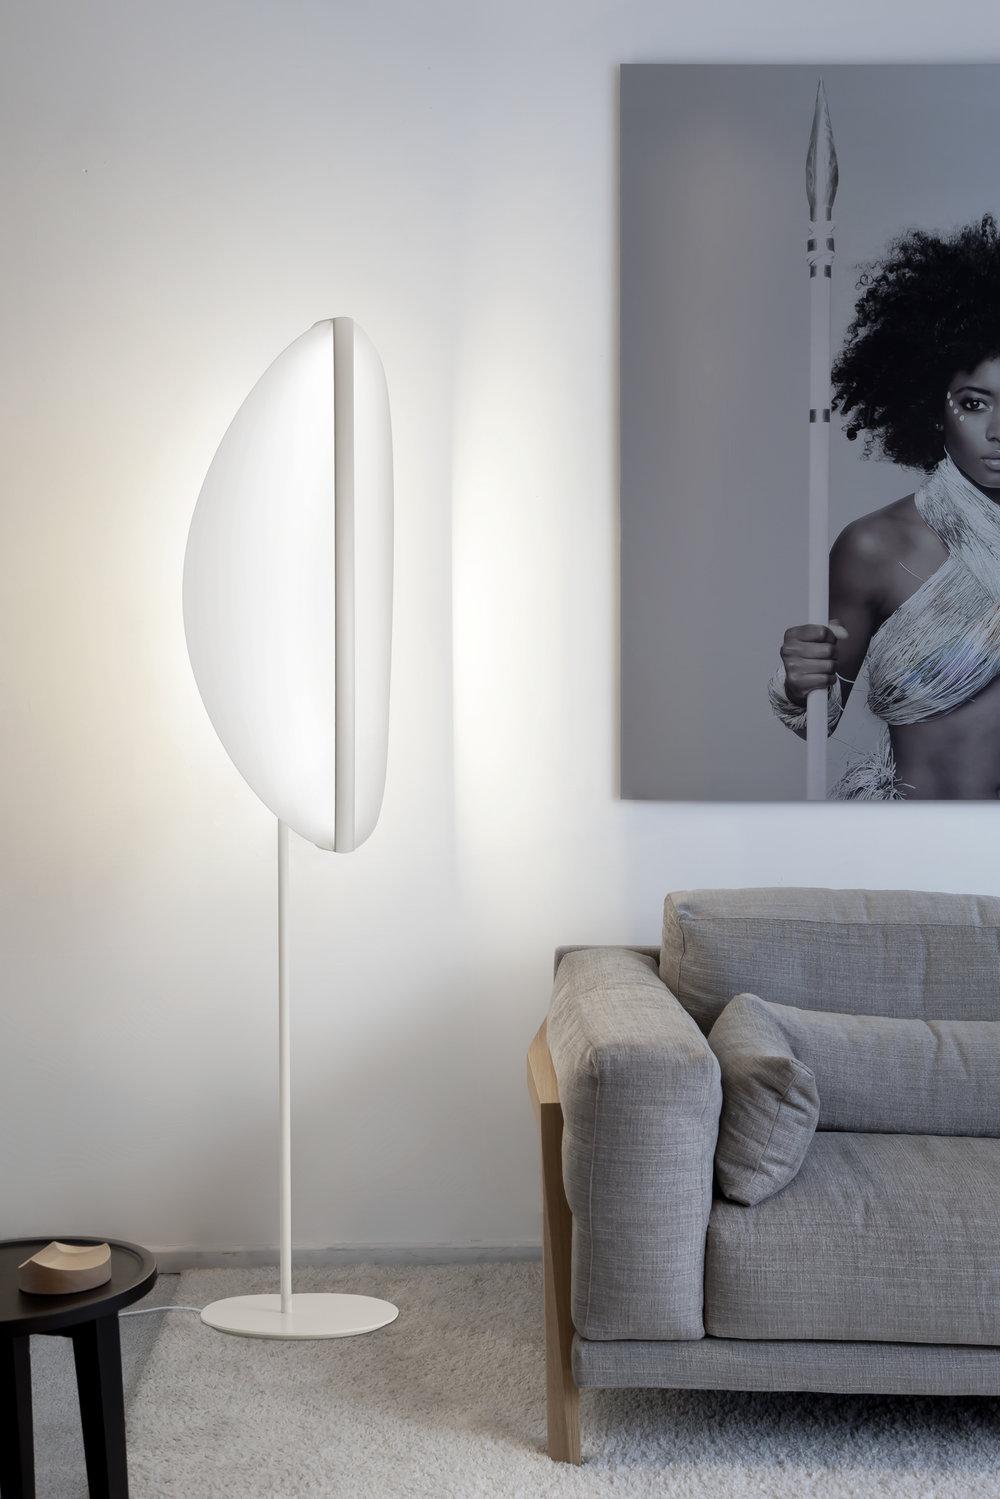 Shield Light designed by Kutarq Studio